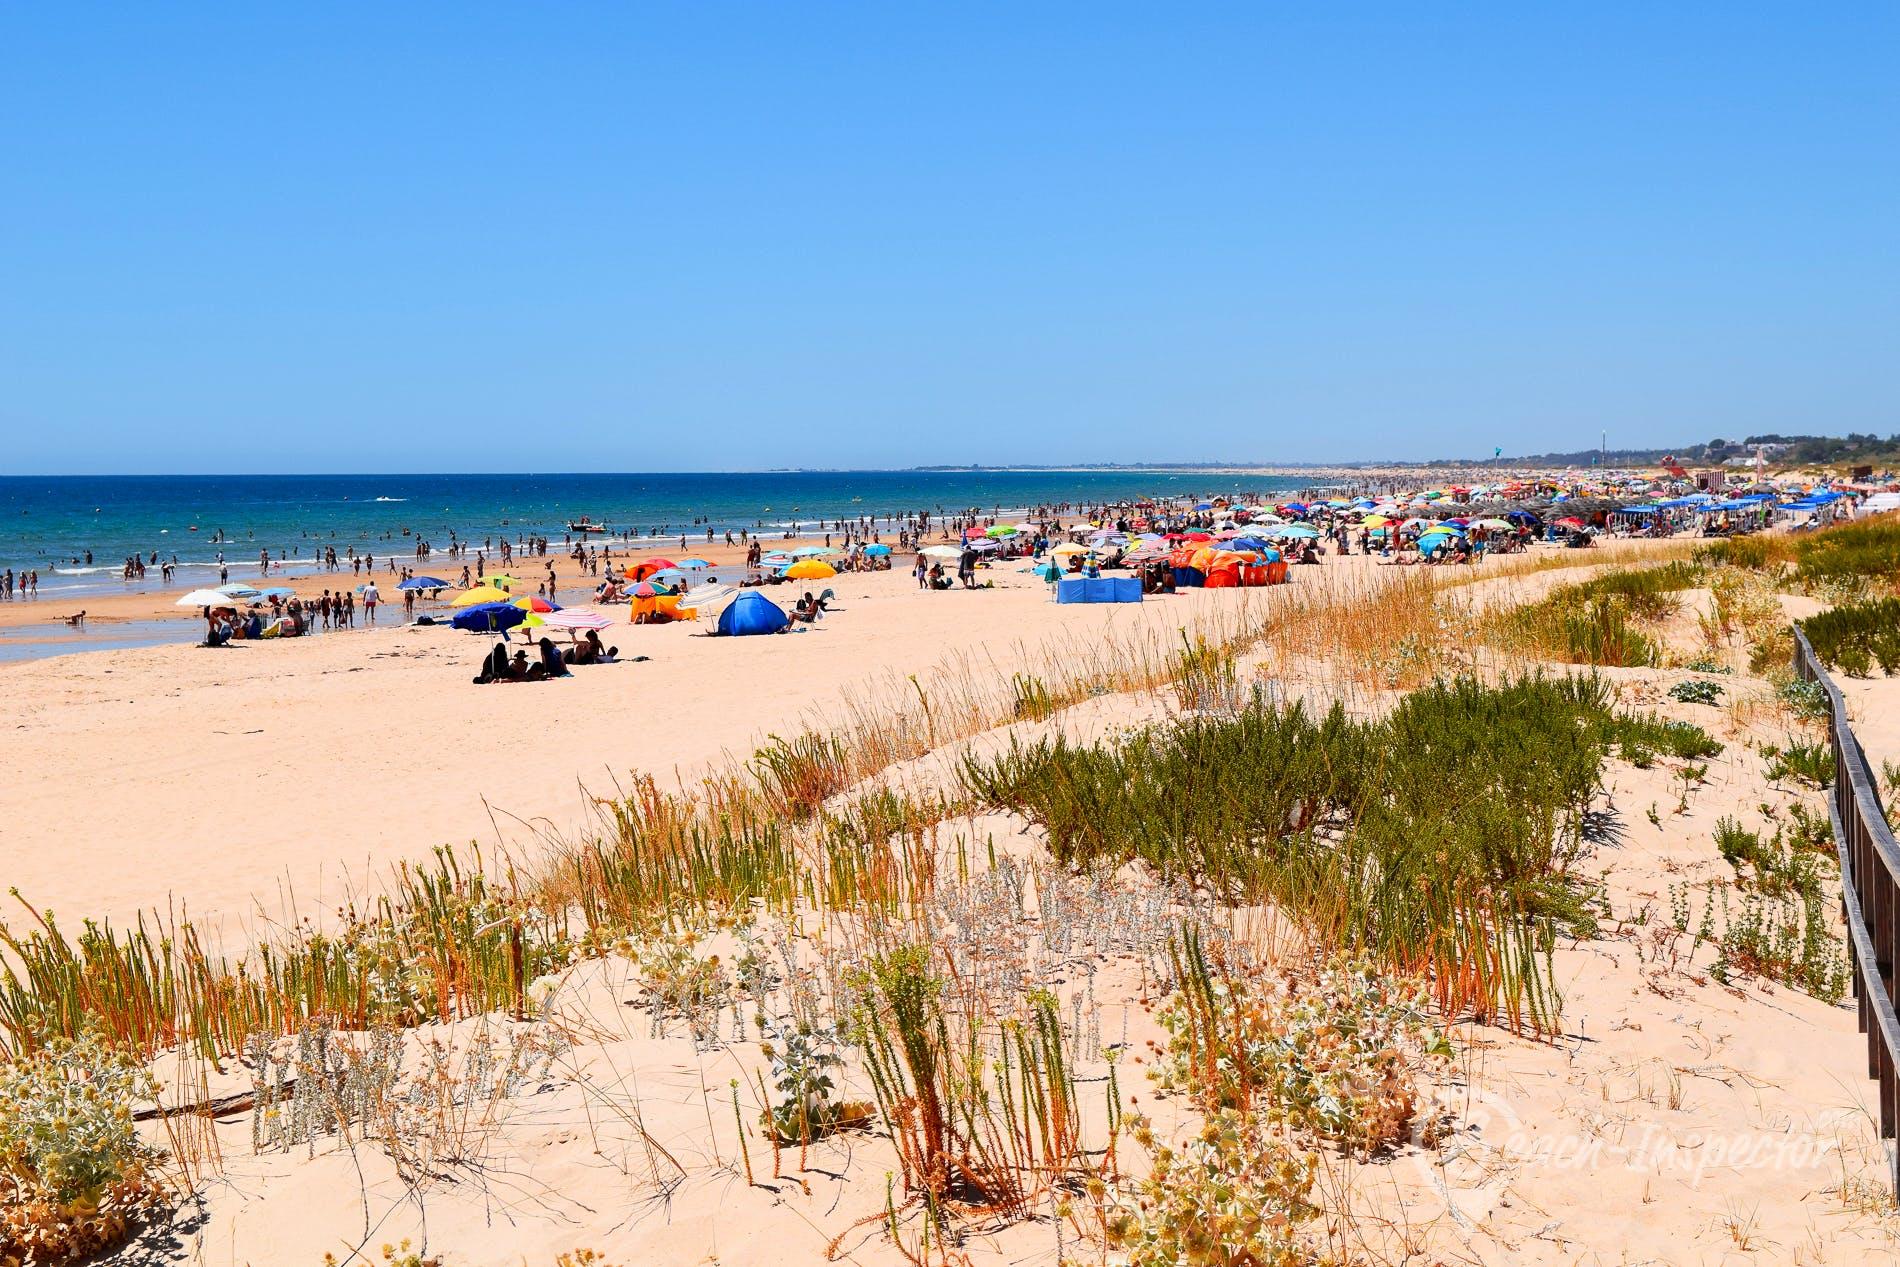 Beach Praia da Alagoa, Algarve, Portugal